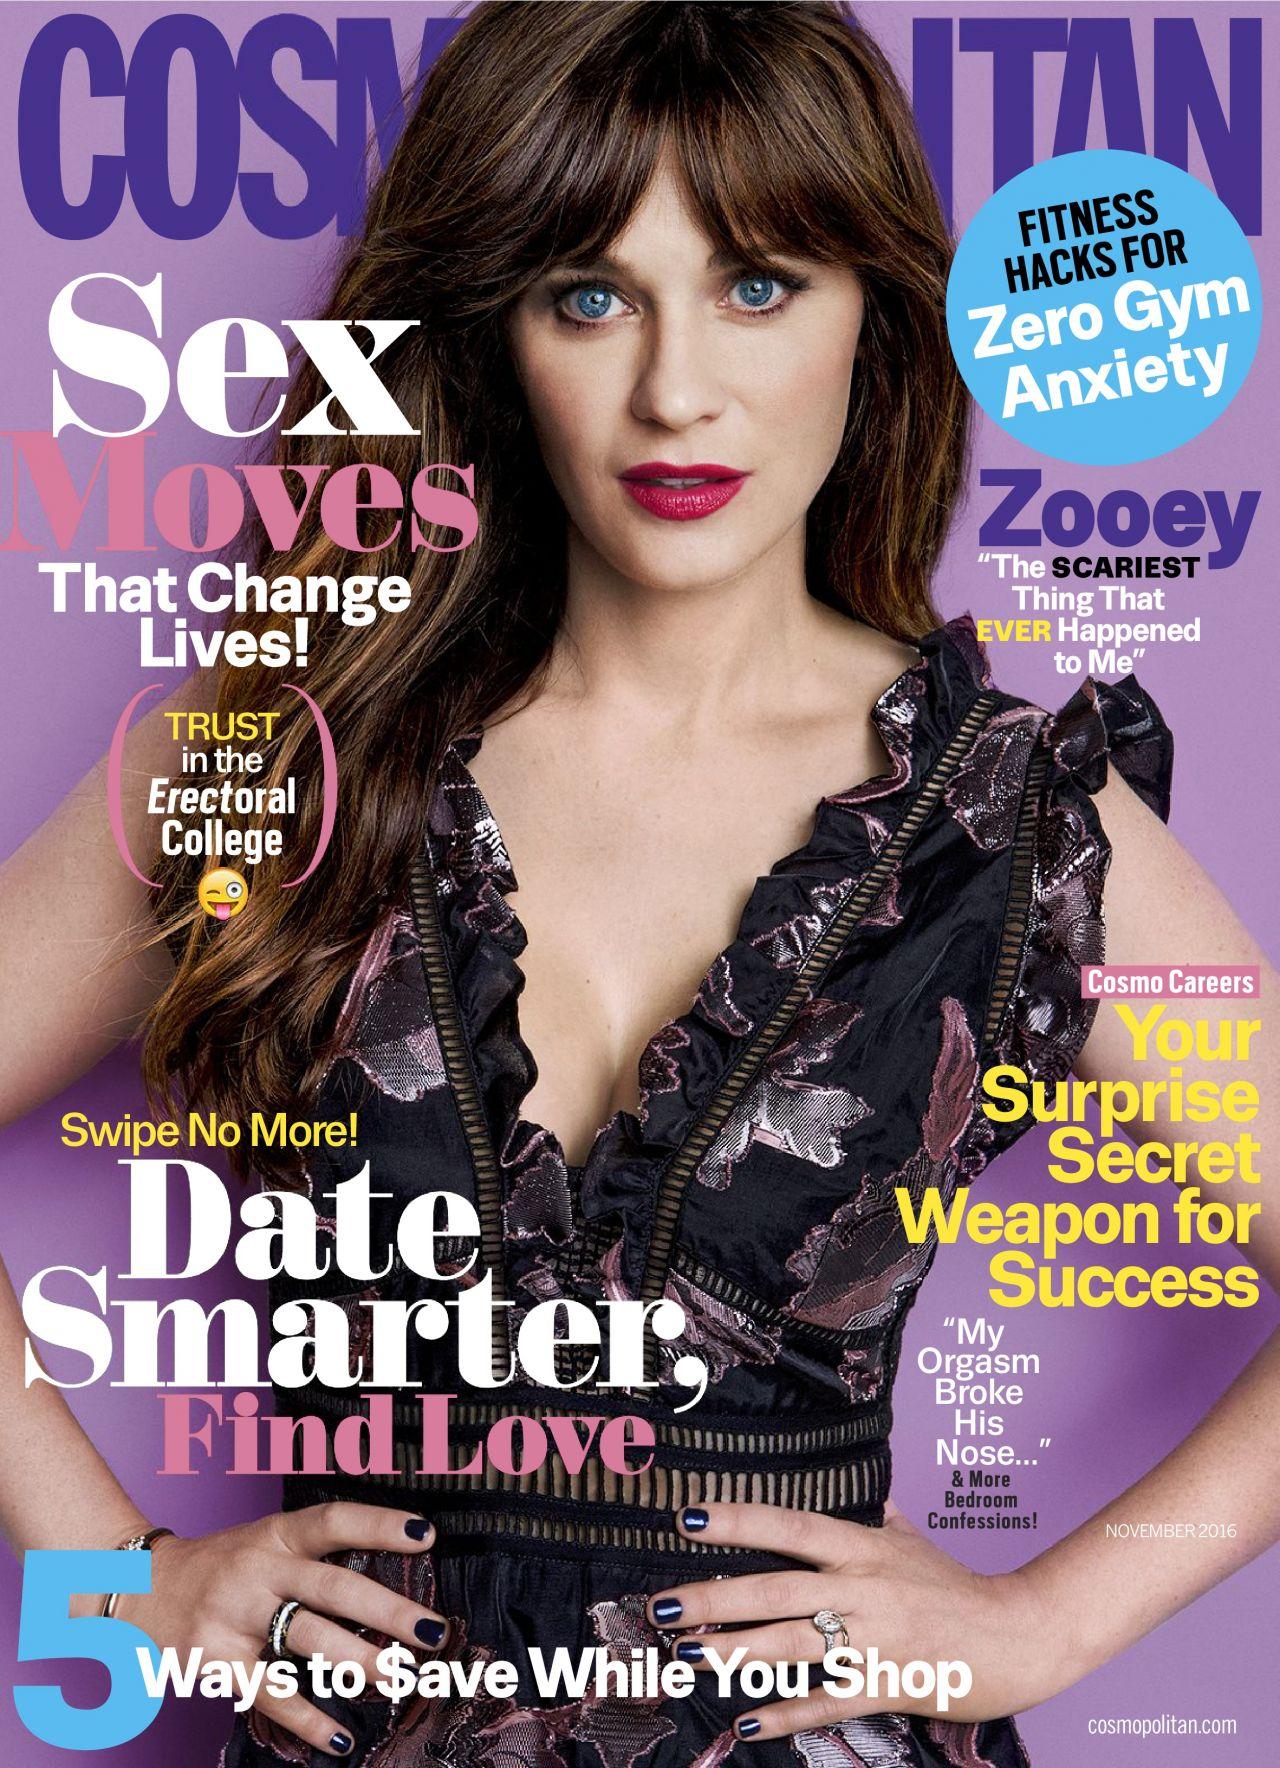 Cosmopolitan Magazine November 2016 Issue